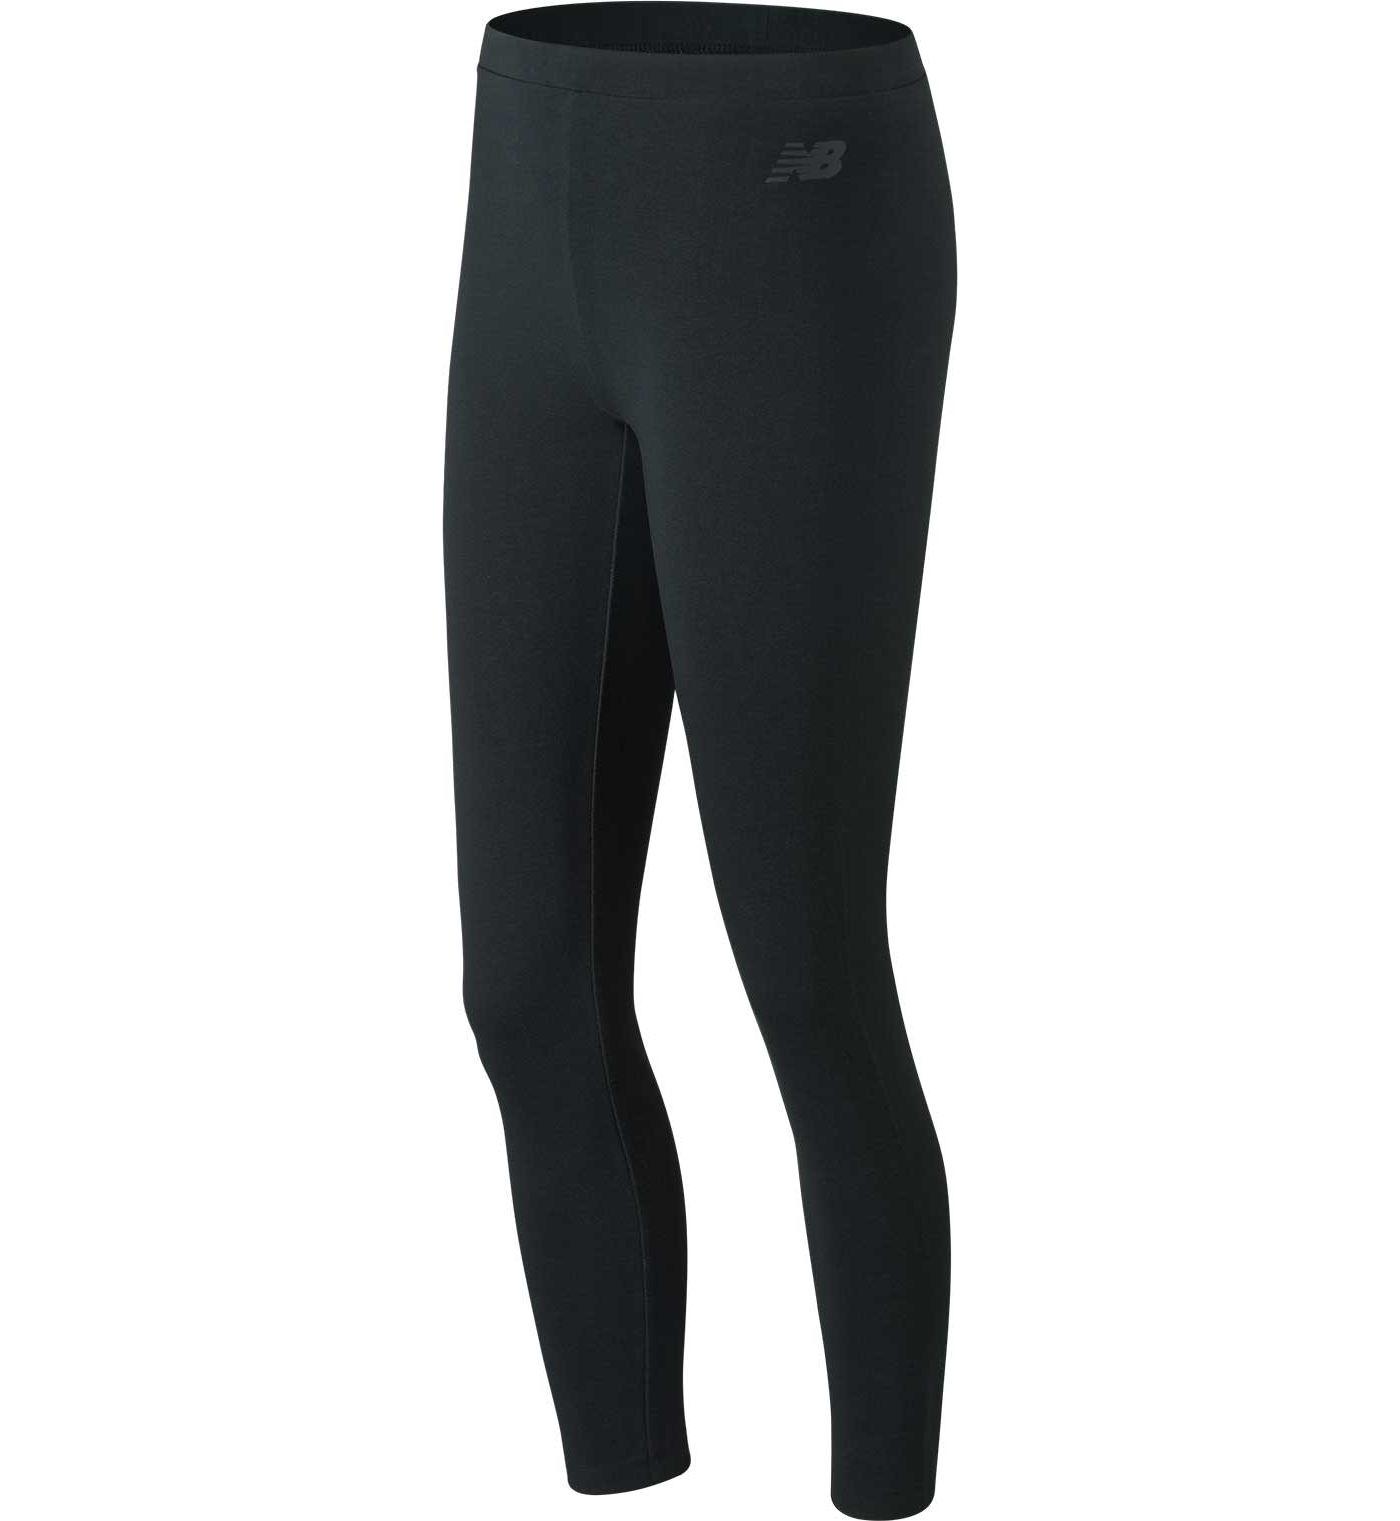 New Balance Women's Essentials Aqua Camo Leggings